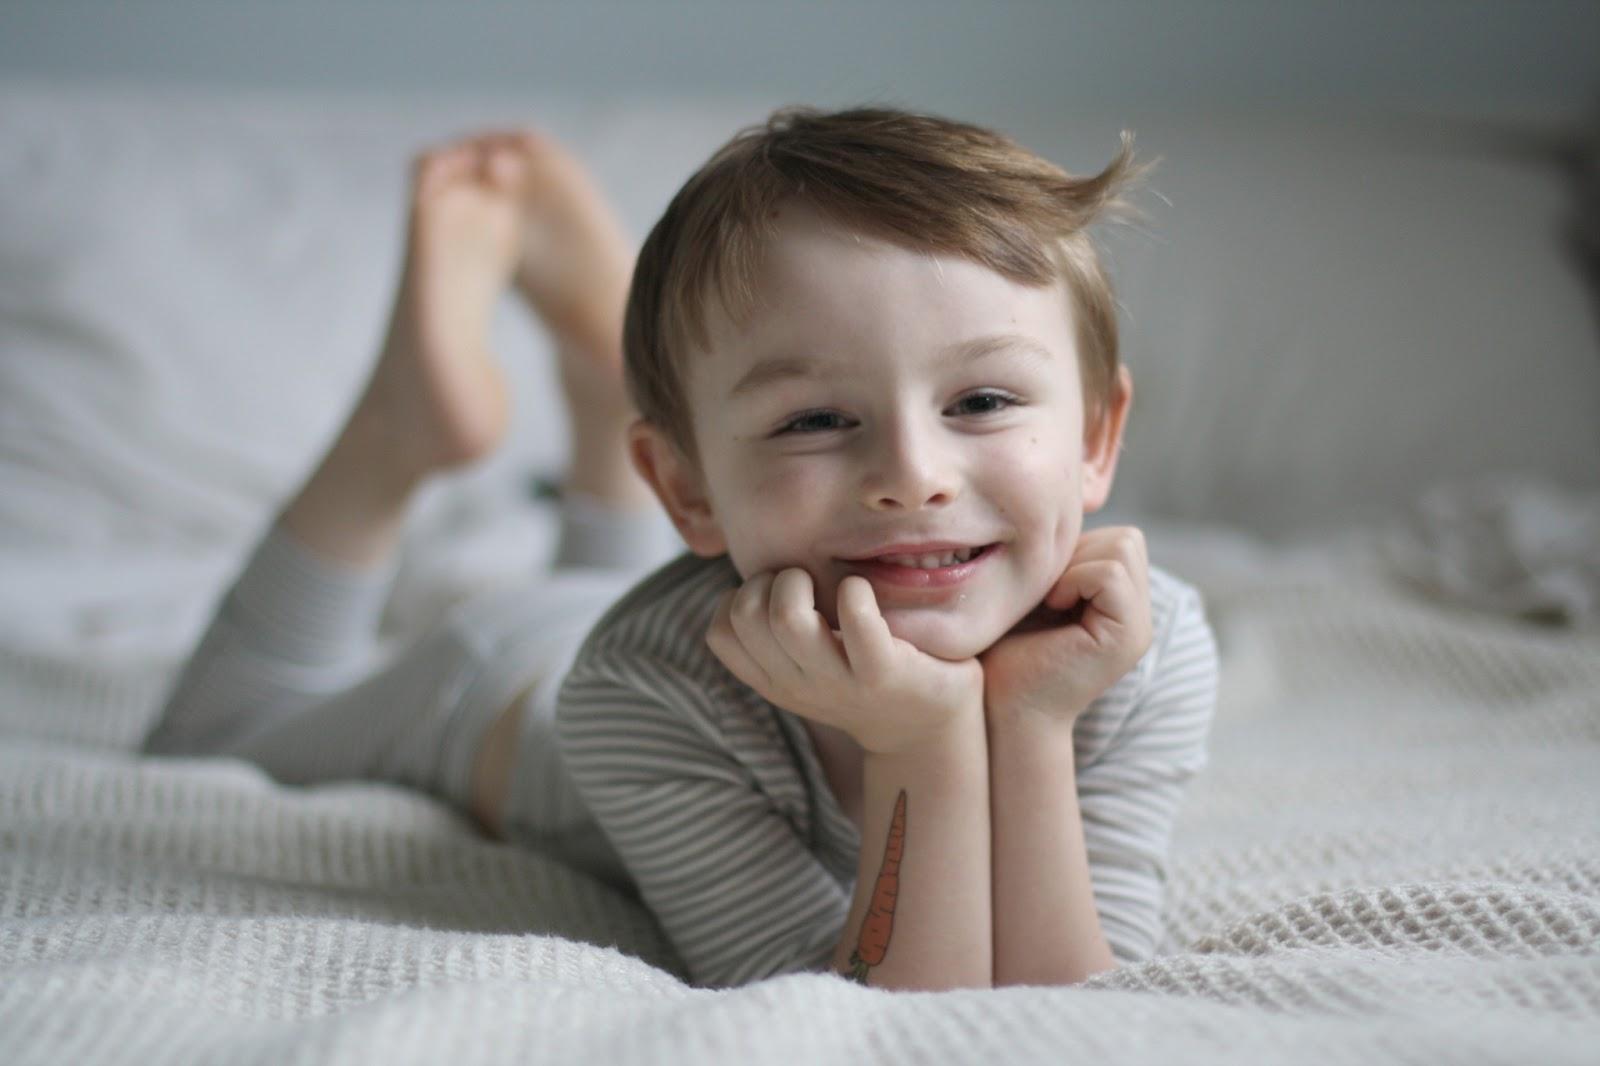 Imagini pentru 3 year old